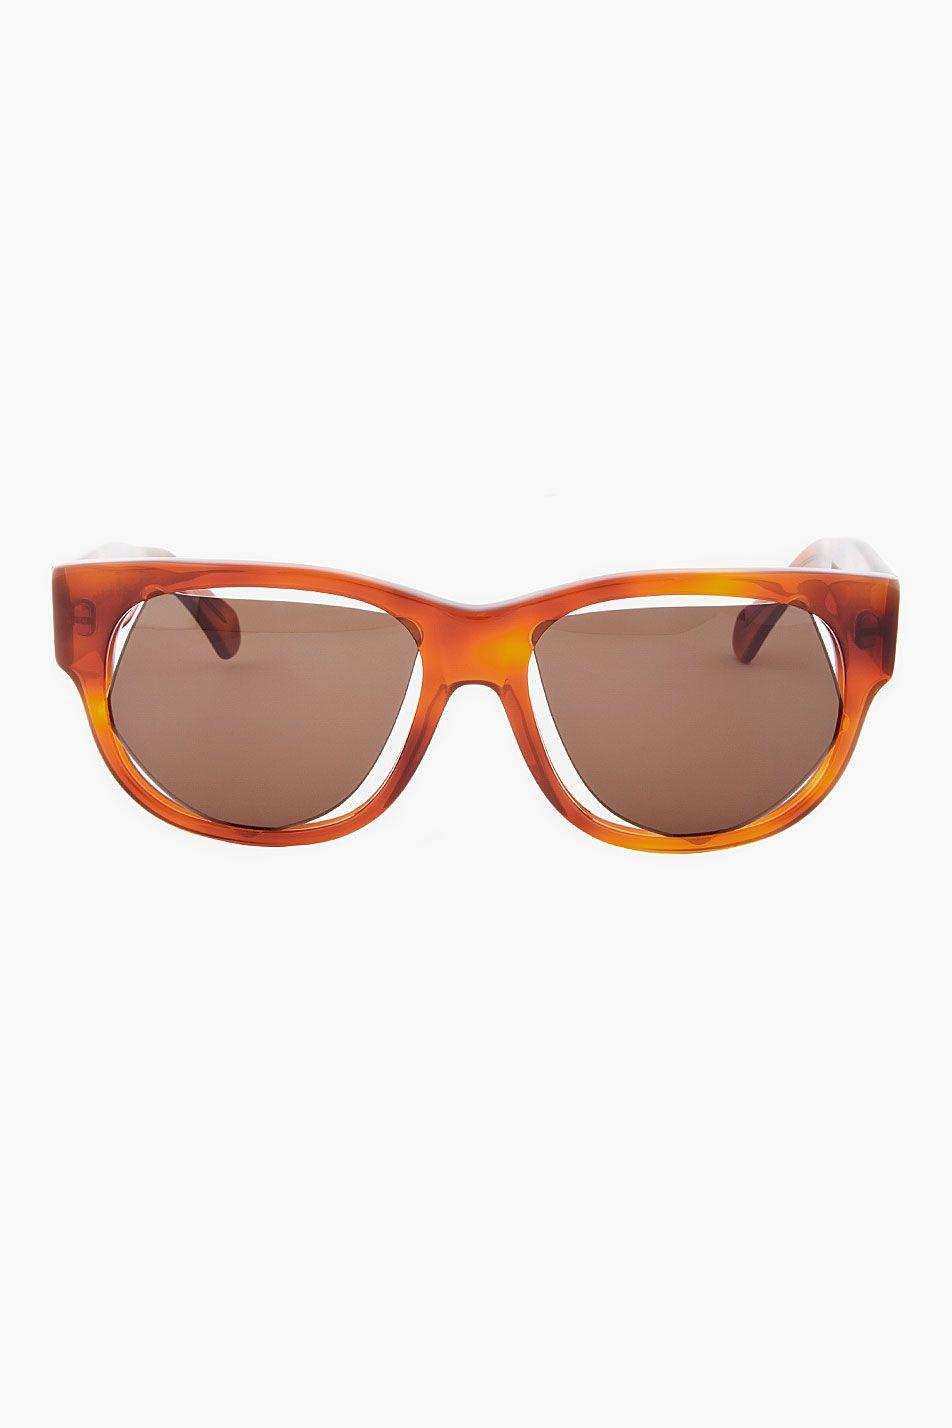 Wrong Margiela Tan Grooms Maison Martin Size SunglassesMen Rj4L35Aq